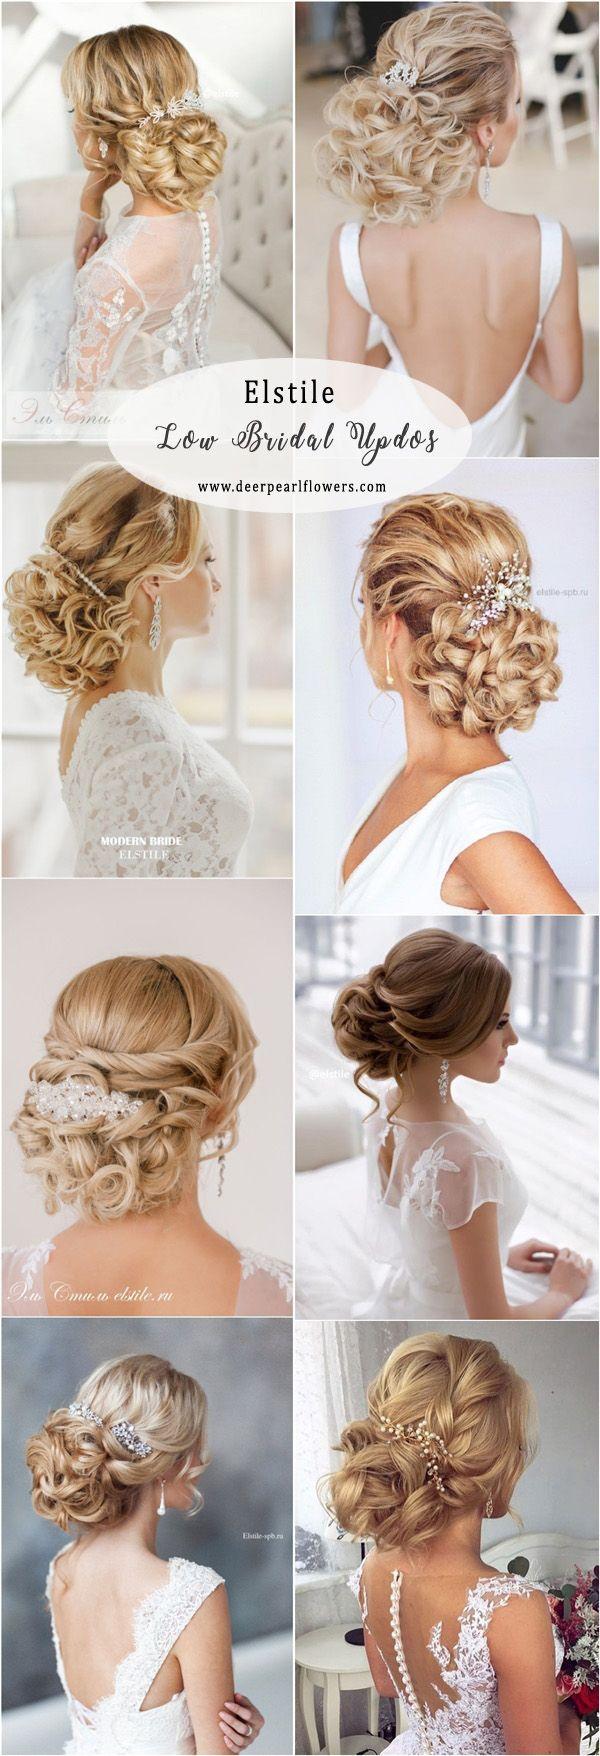 54 Best Elstile Wedding Hairstyles for 2018   Updos, Weddingideas ...